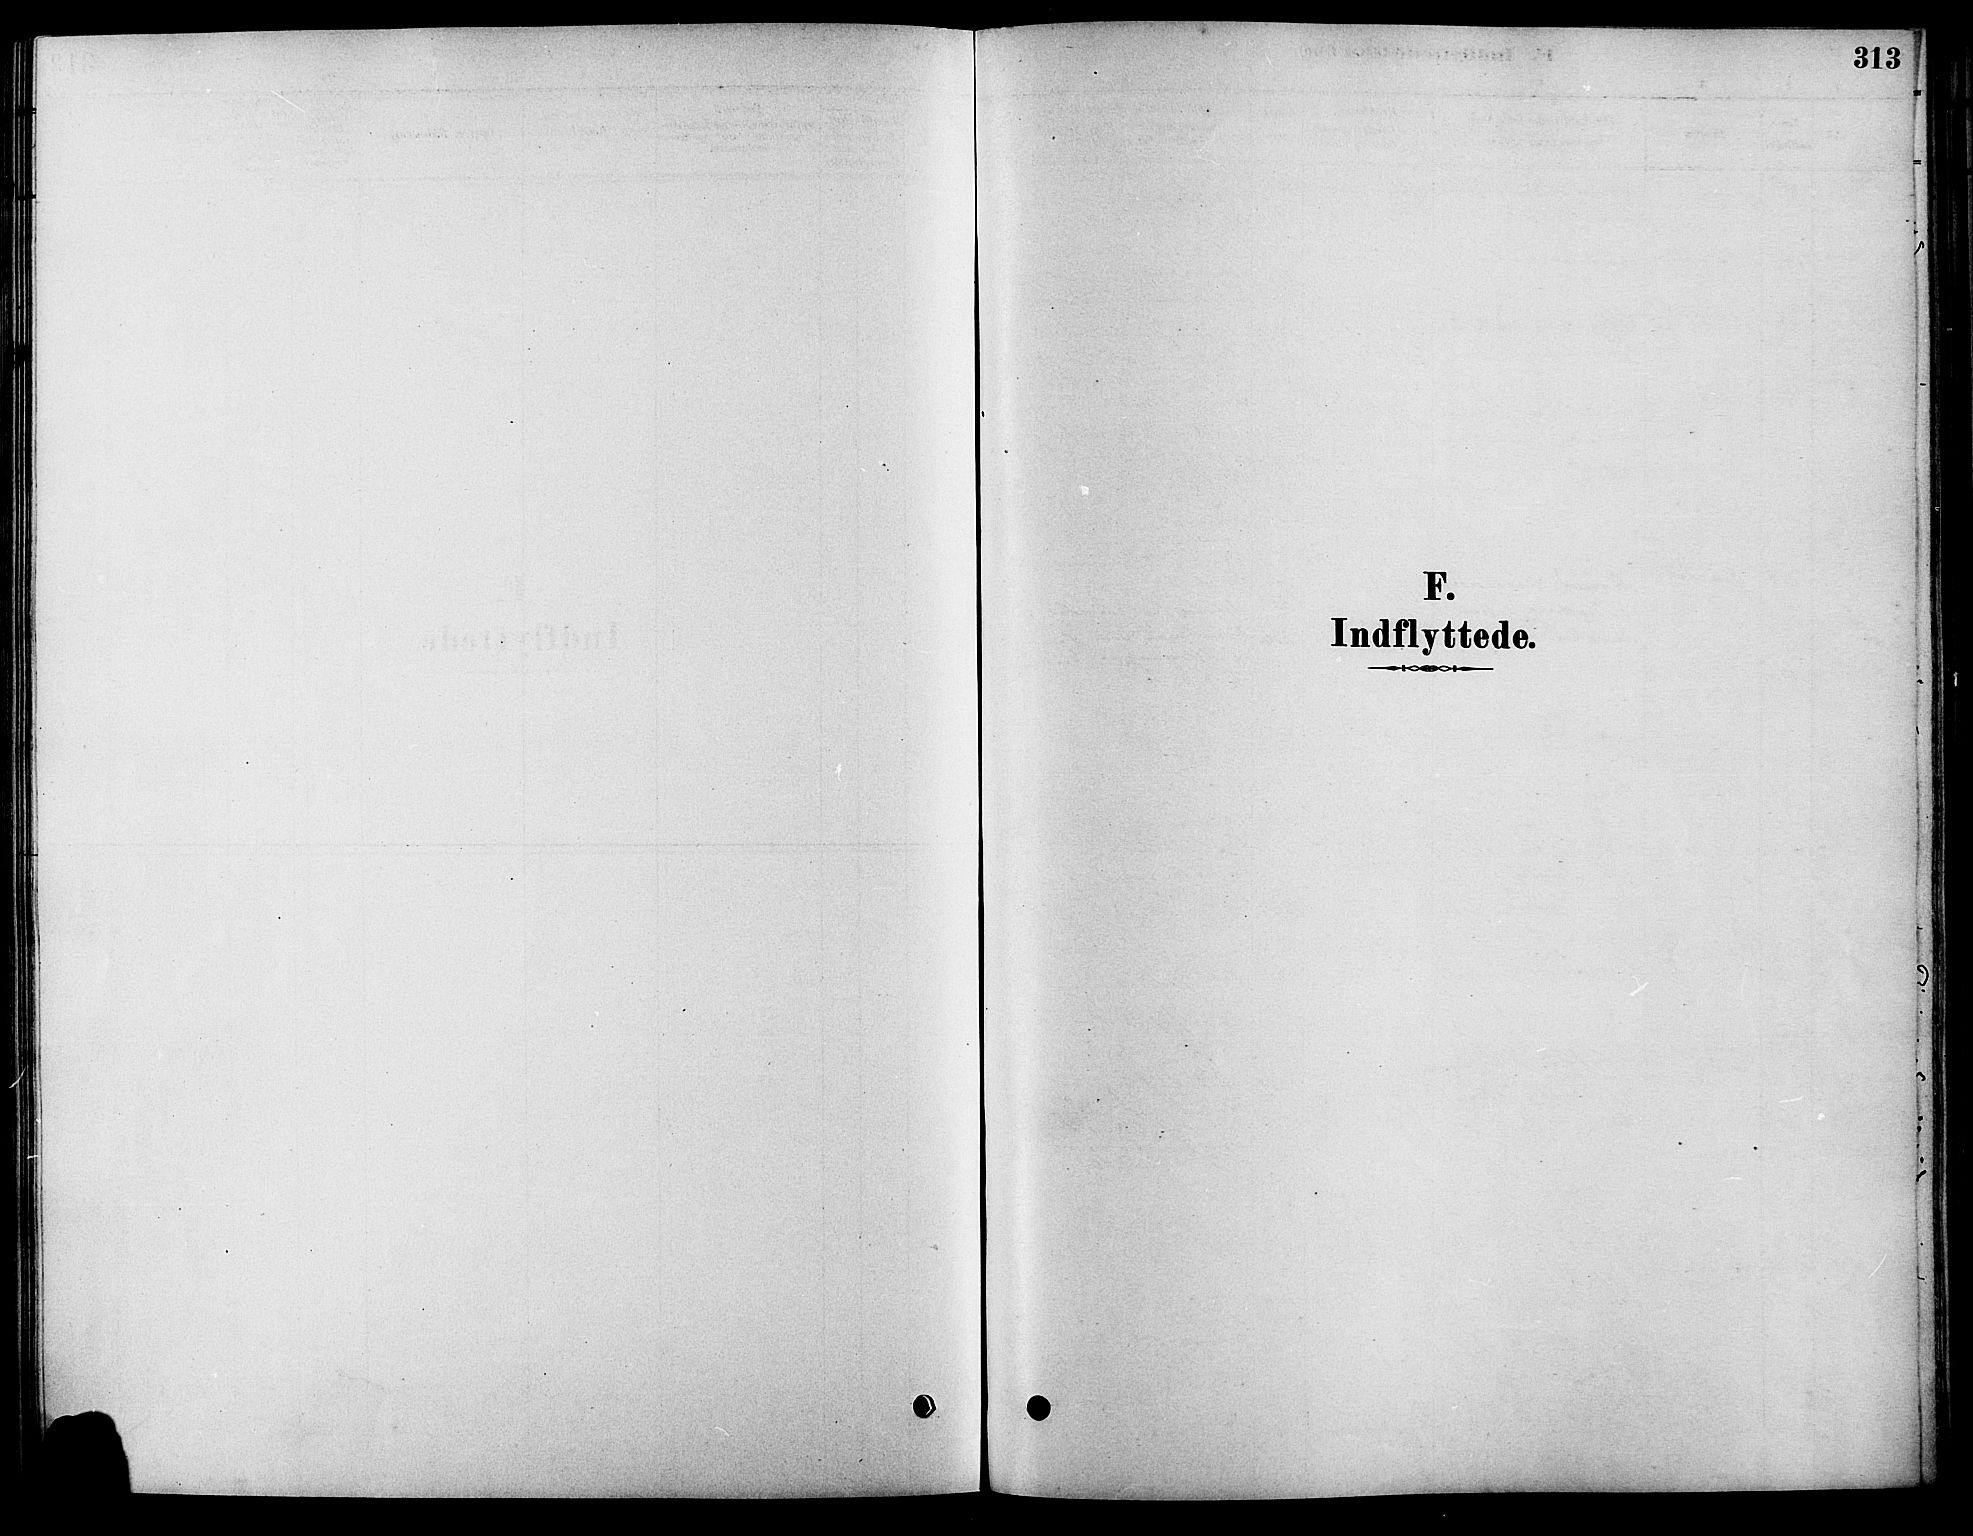 SAH, Fåberg prestekontor, Ministerialbok nr. 8, 1879-1898, s. 313